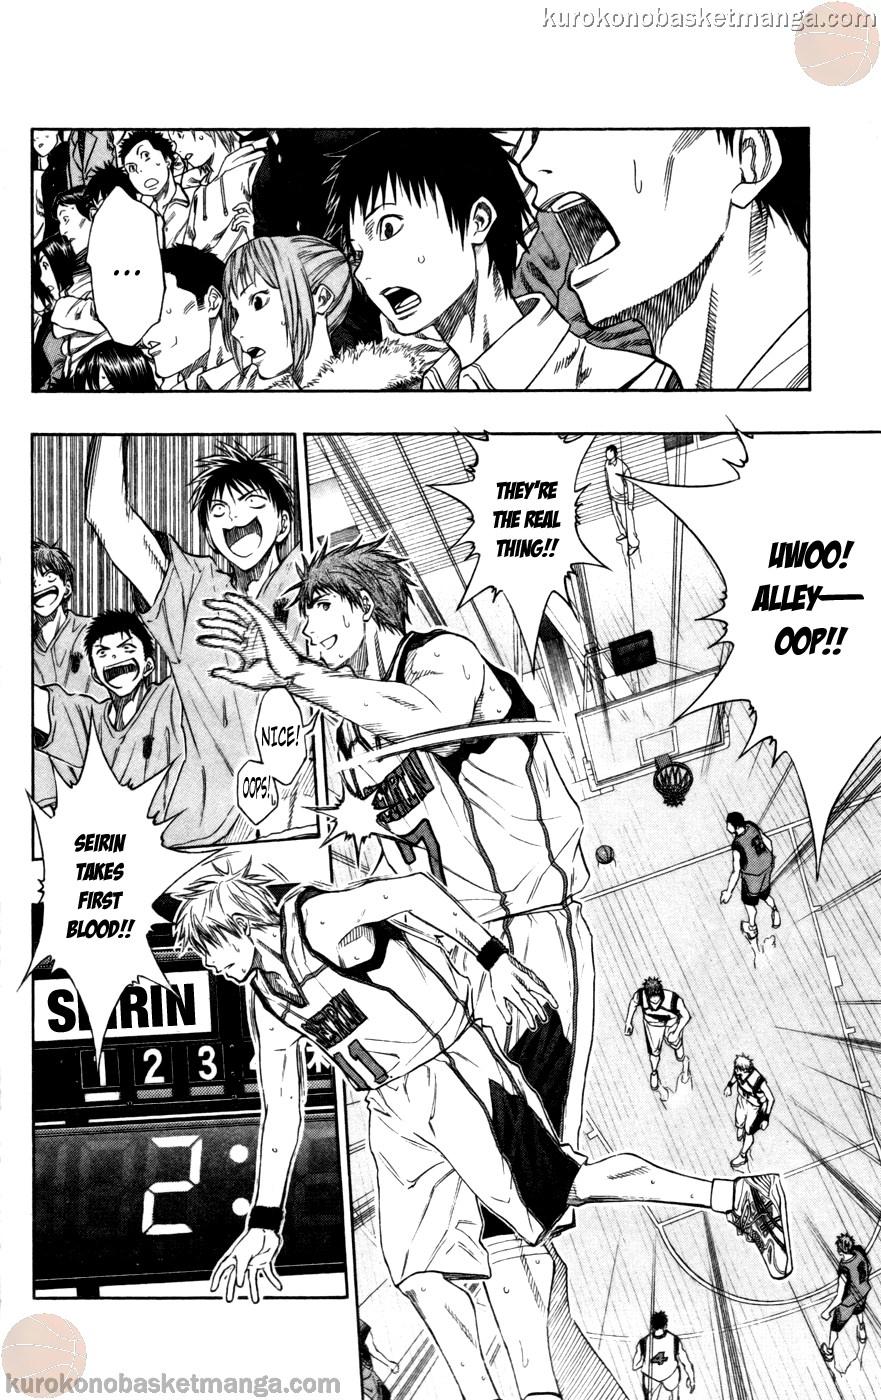 Kuroko no Basket Manga Chapter 101 - Image 05